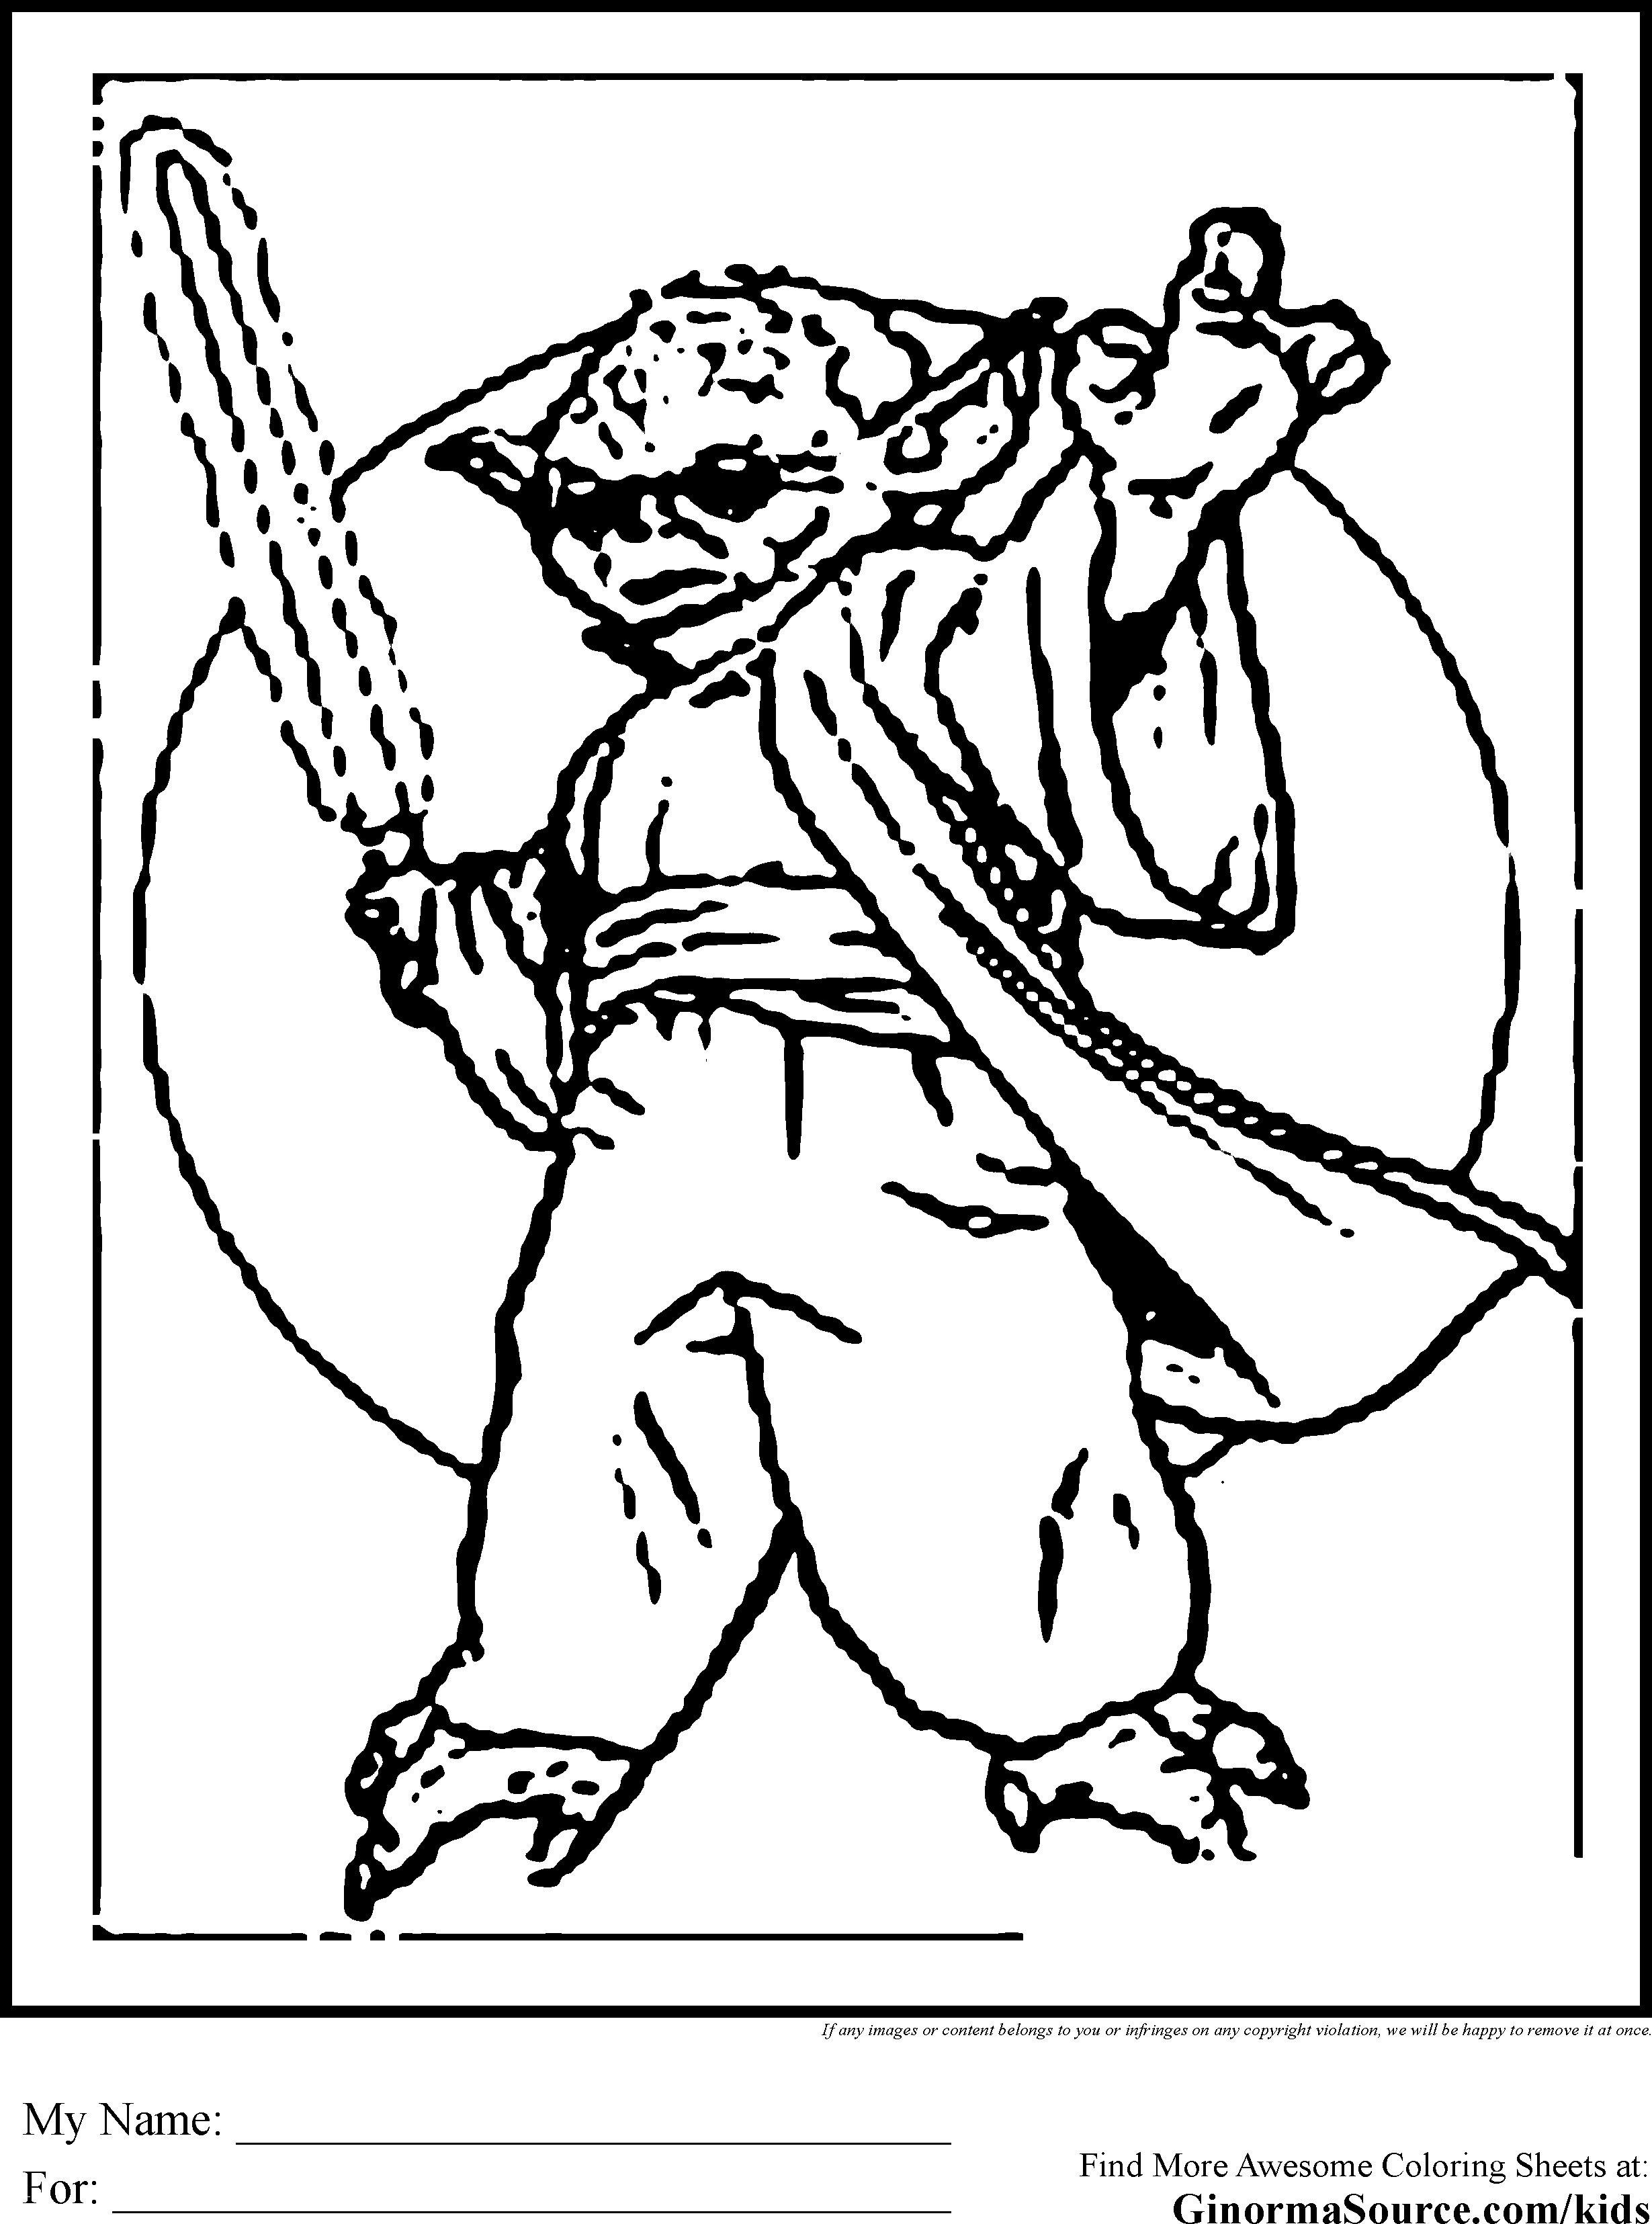 Ausmalbilder Minni Maus Genial Yoda Ausmalbilder Elegant Star Wars Printable Coloring Pages Fresh Fotografieren